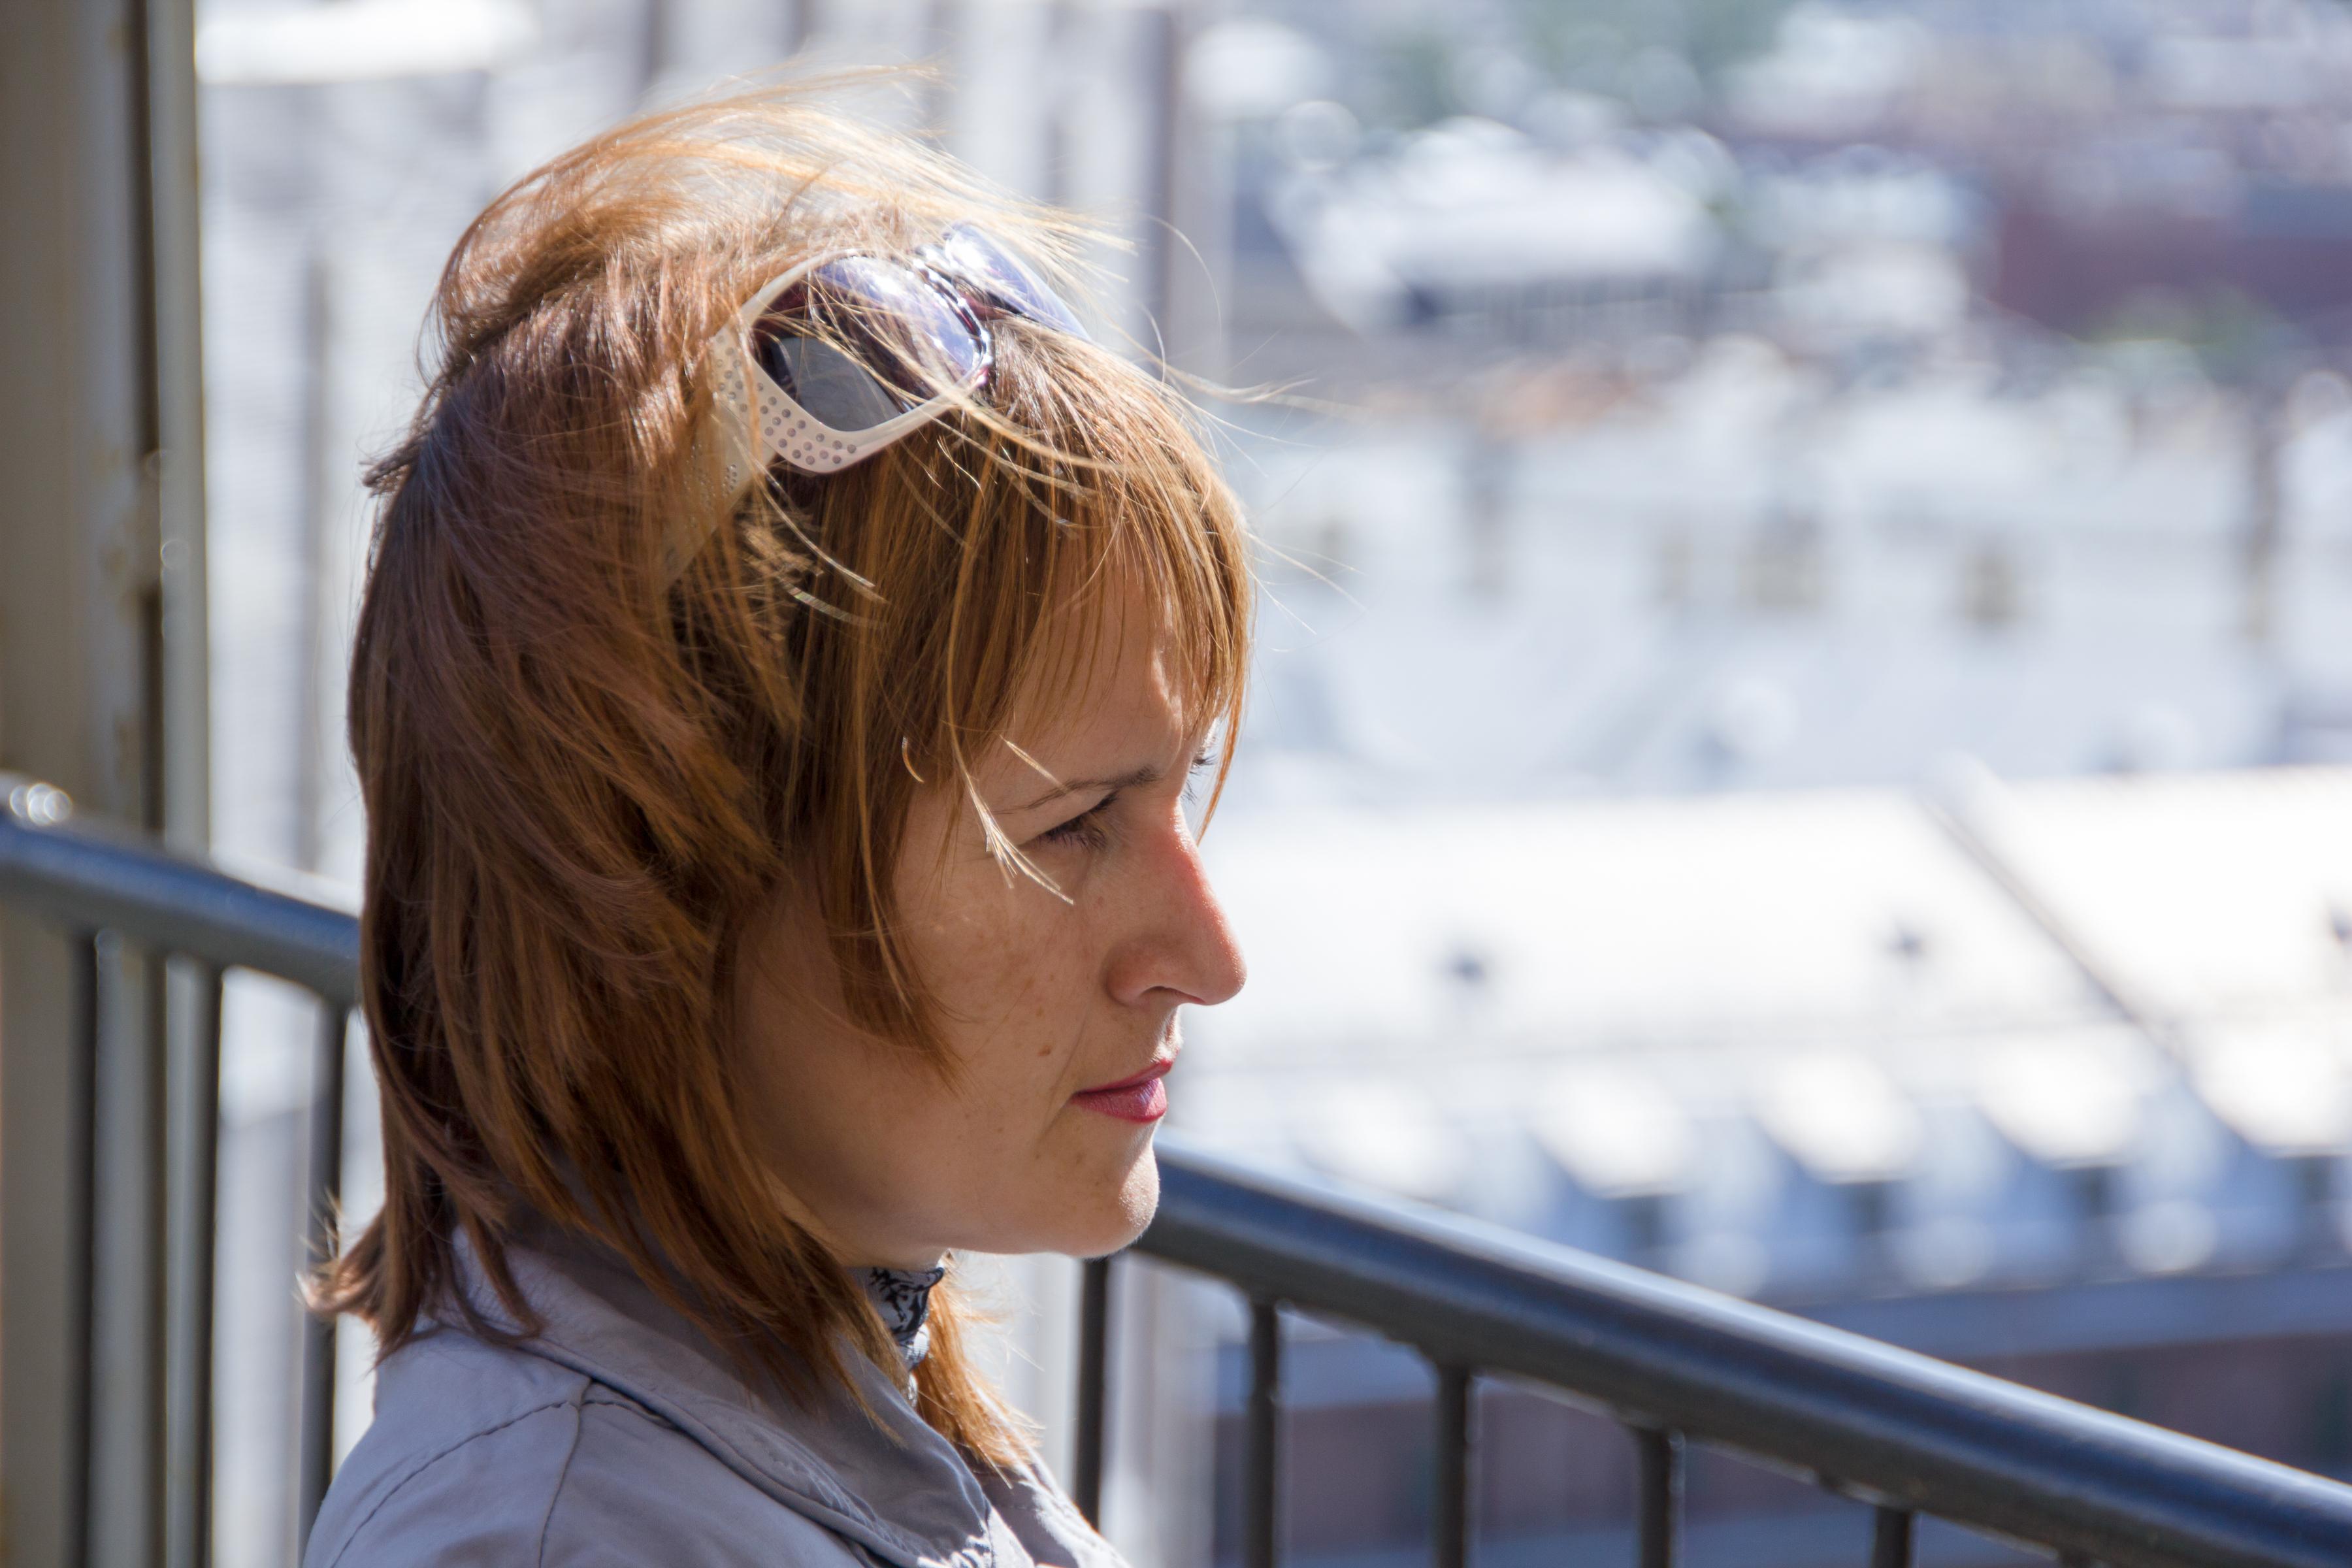 Woman face, 30s, Middleaged, Single, Portrait, HQ Photo